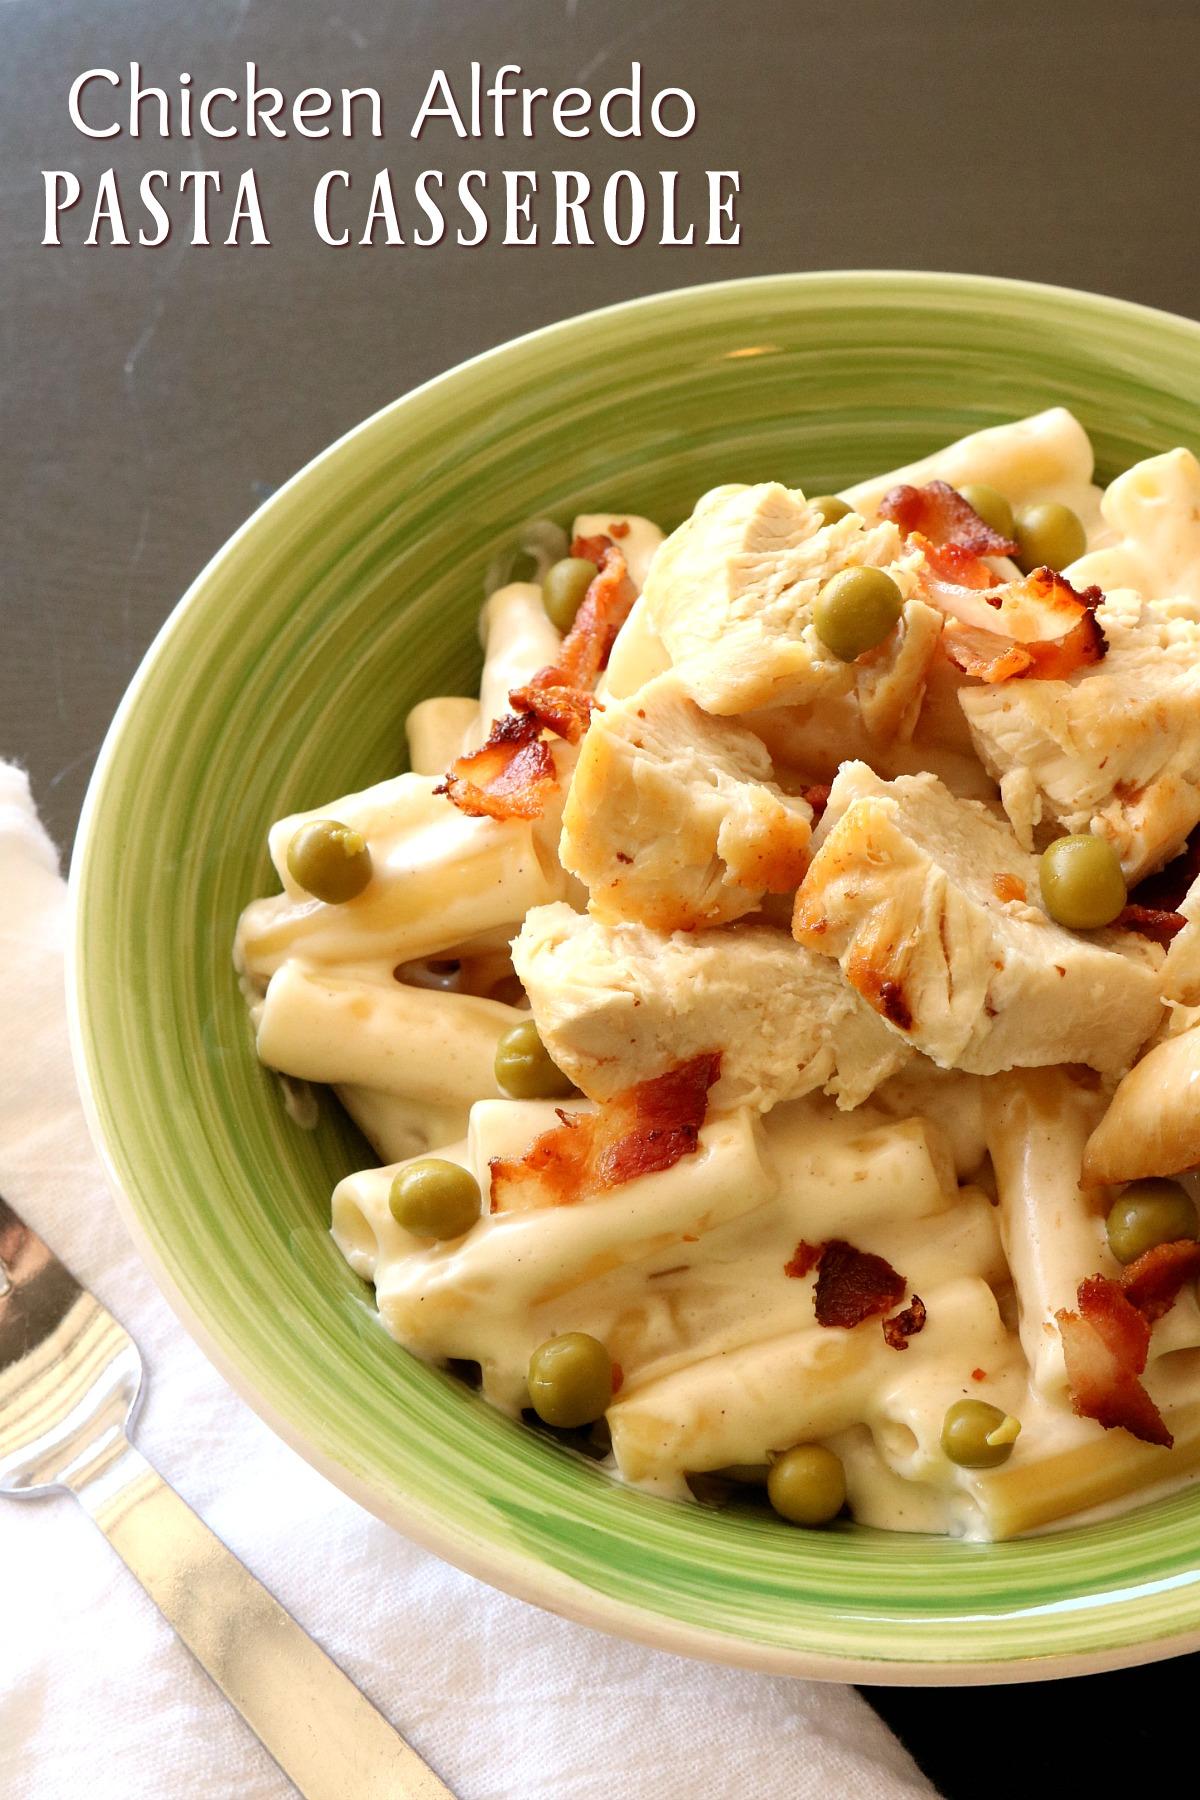 Chicken Alfredo Pasta Casserole from 5DollarDinners.com